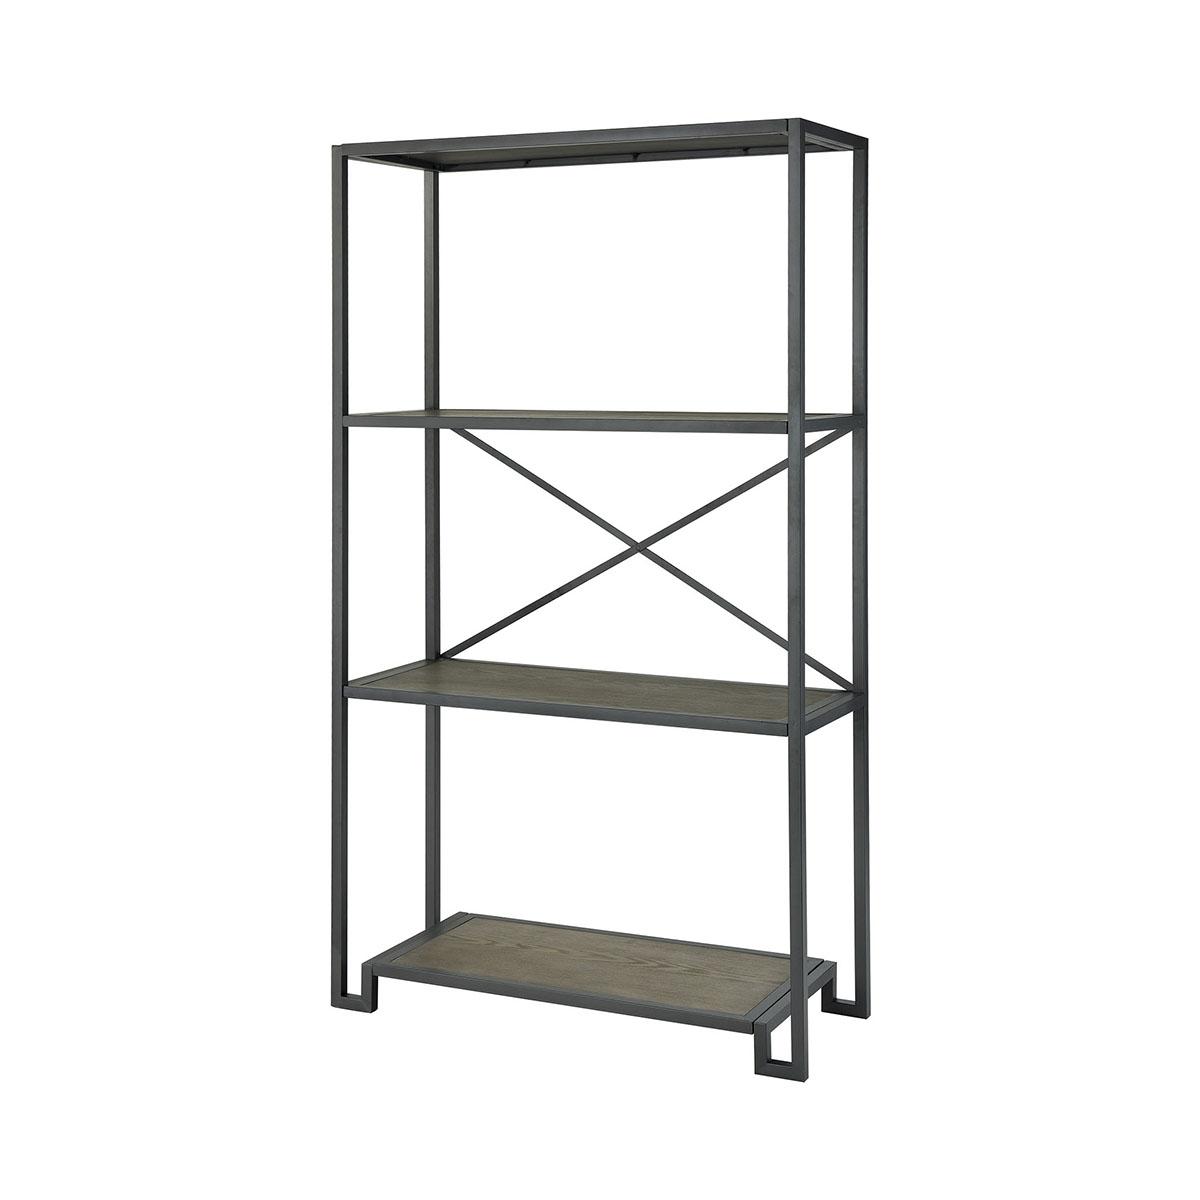 Mezzanine Shelving Unit | Stein World